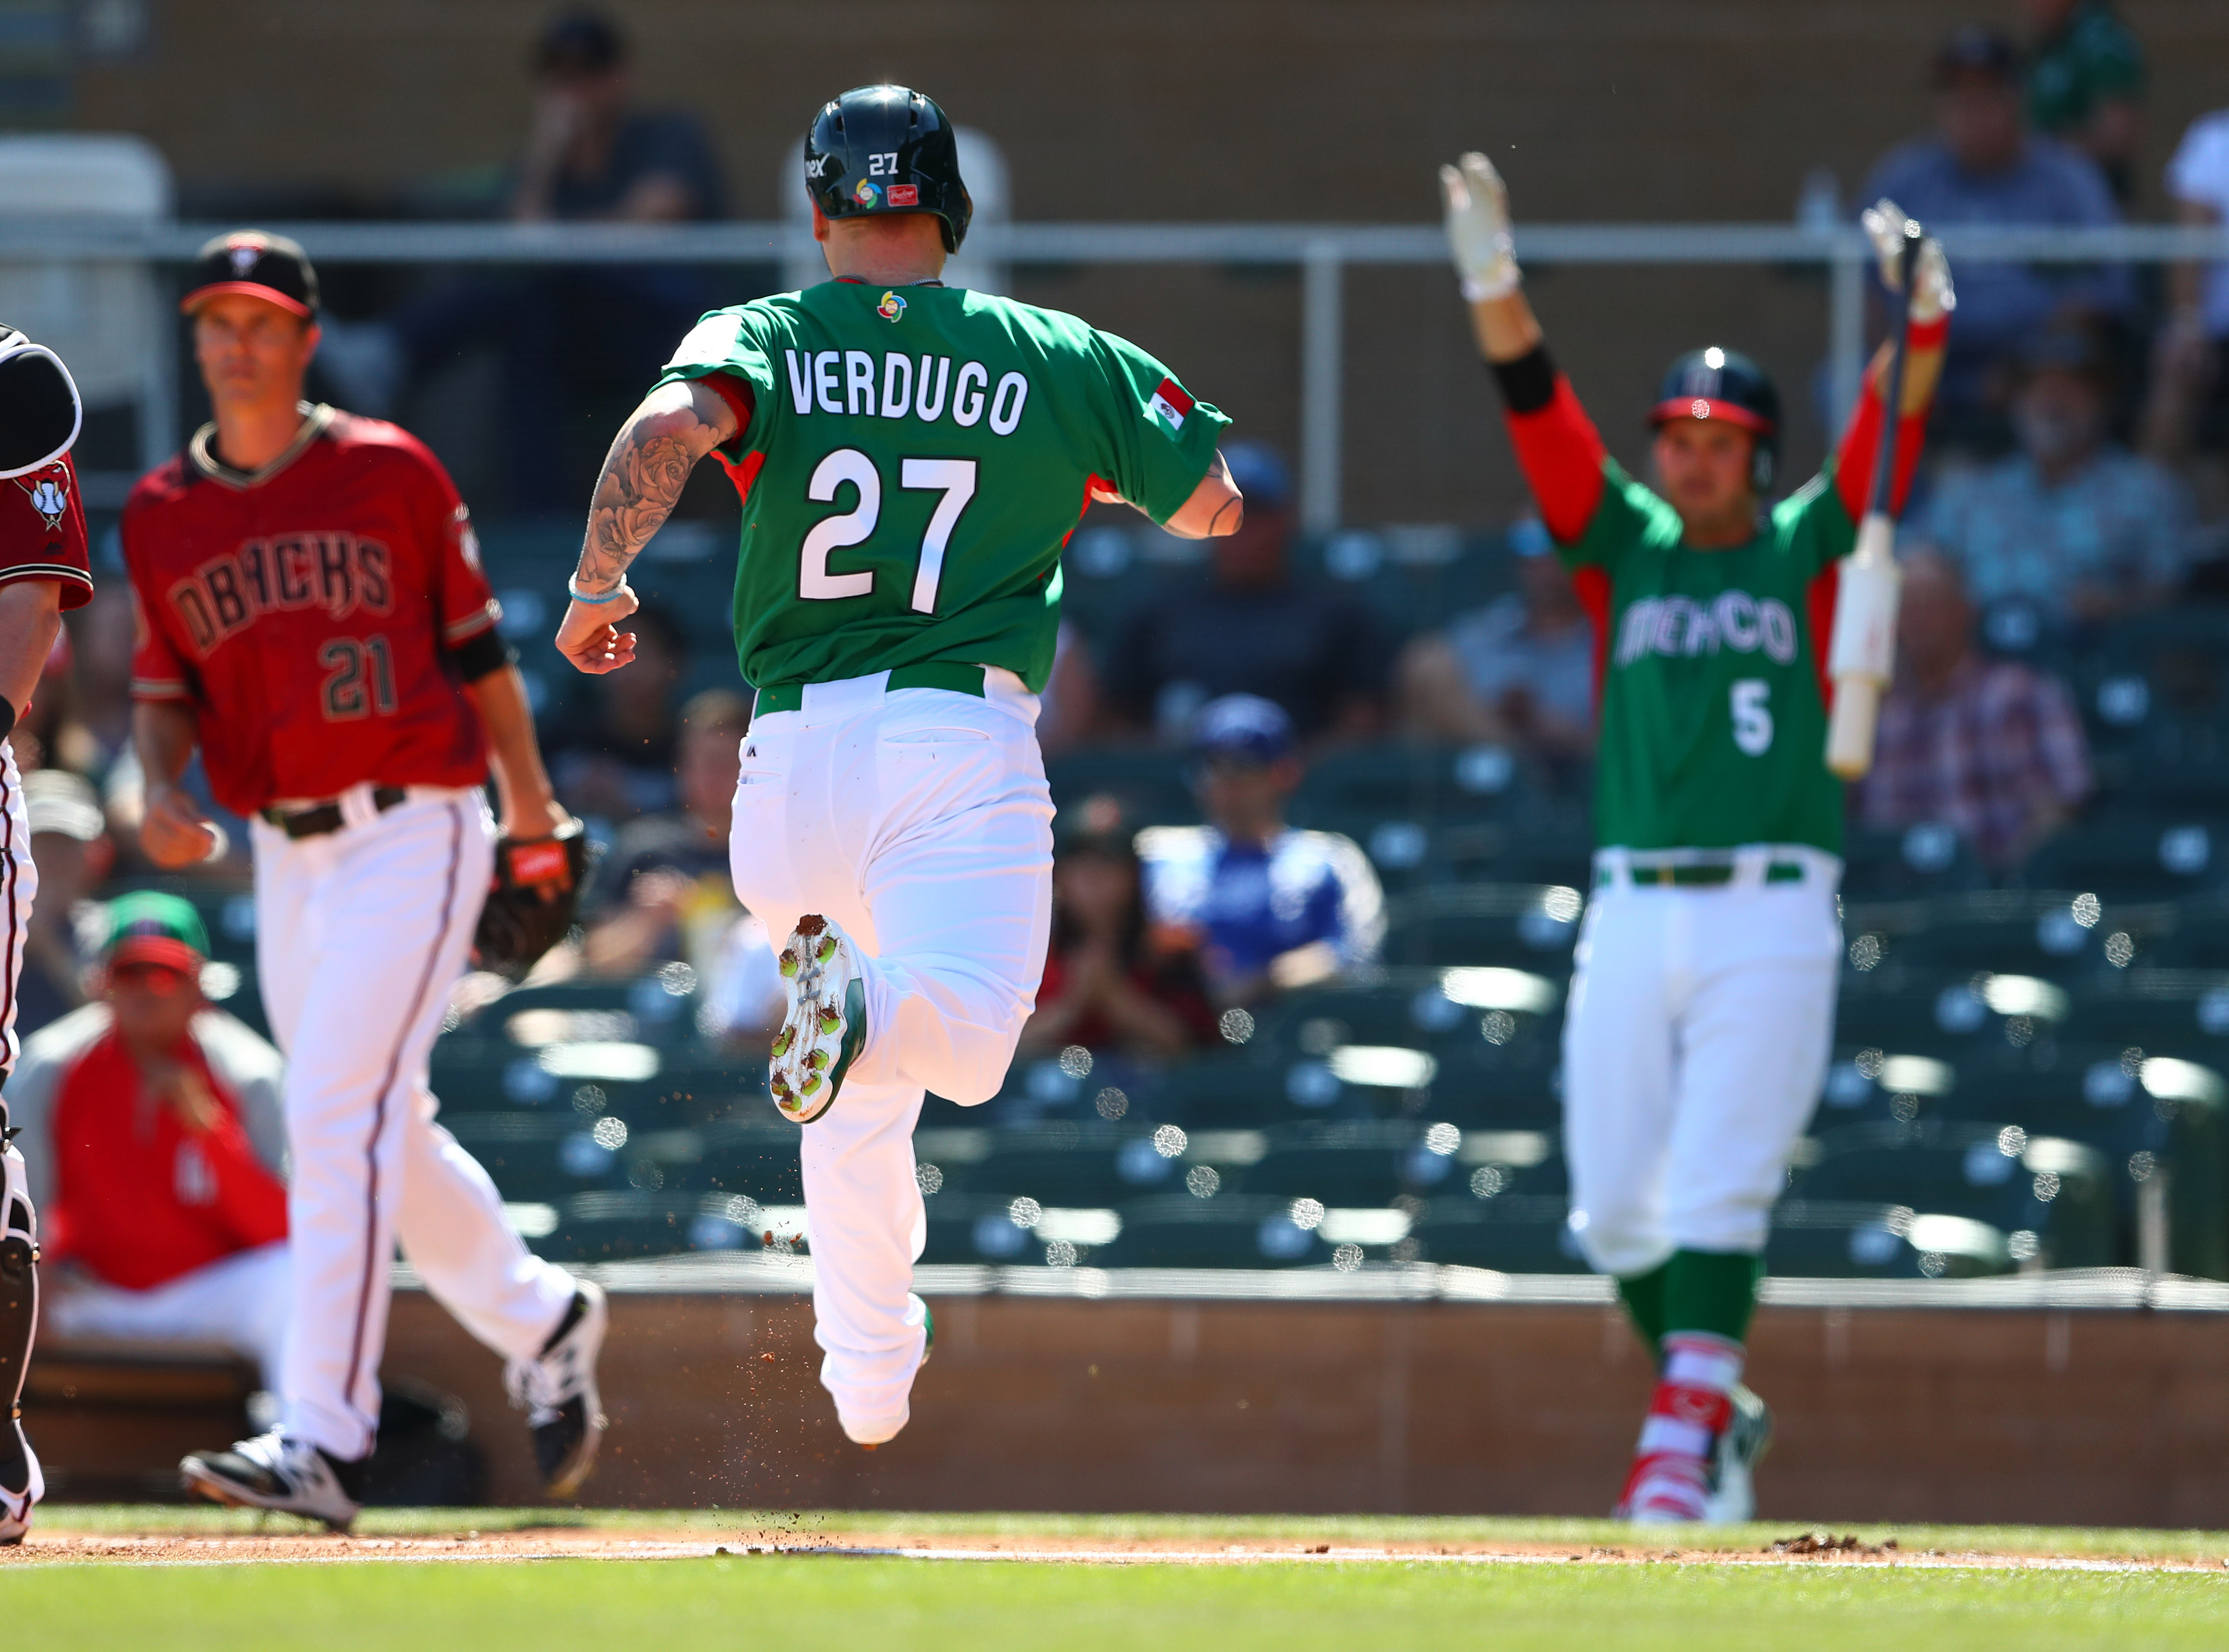 9926228-baseball-world-baseball-classic-exhibion-game-mexico-at-arizona-diamondbacks